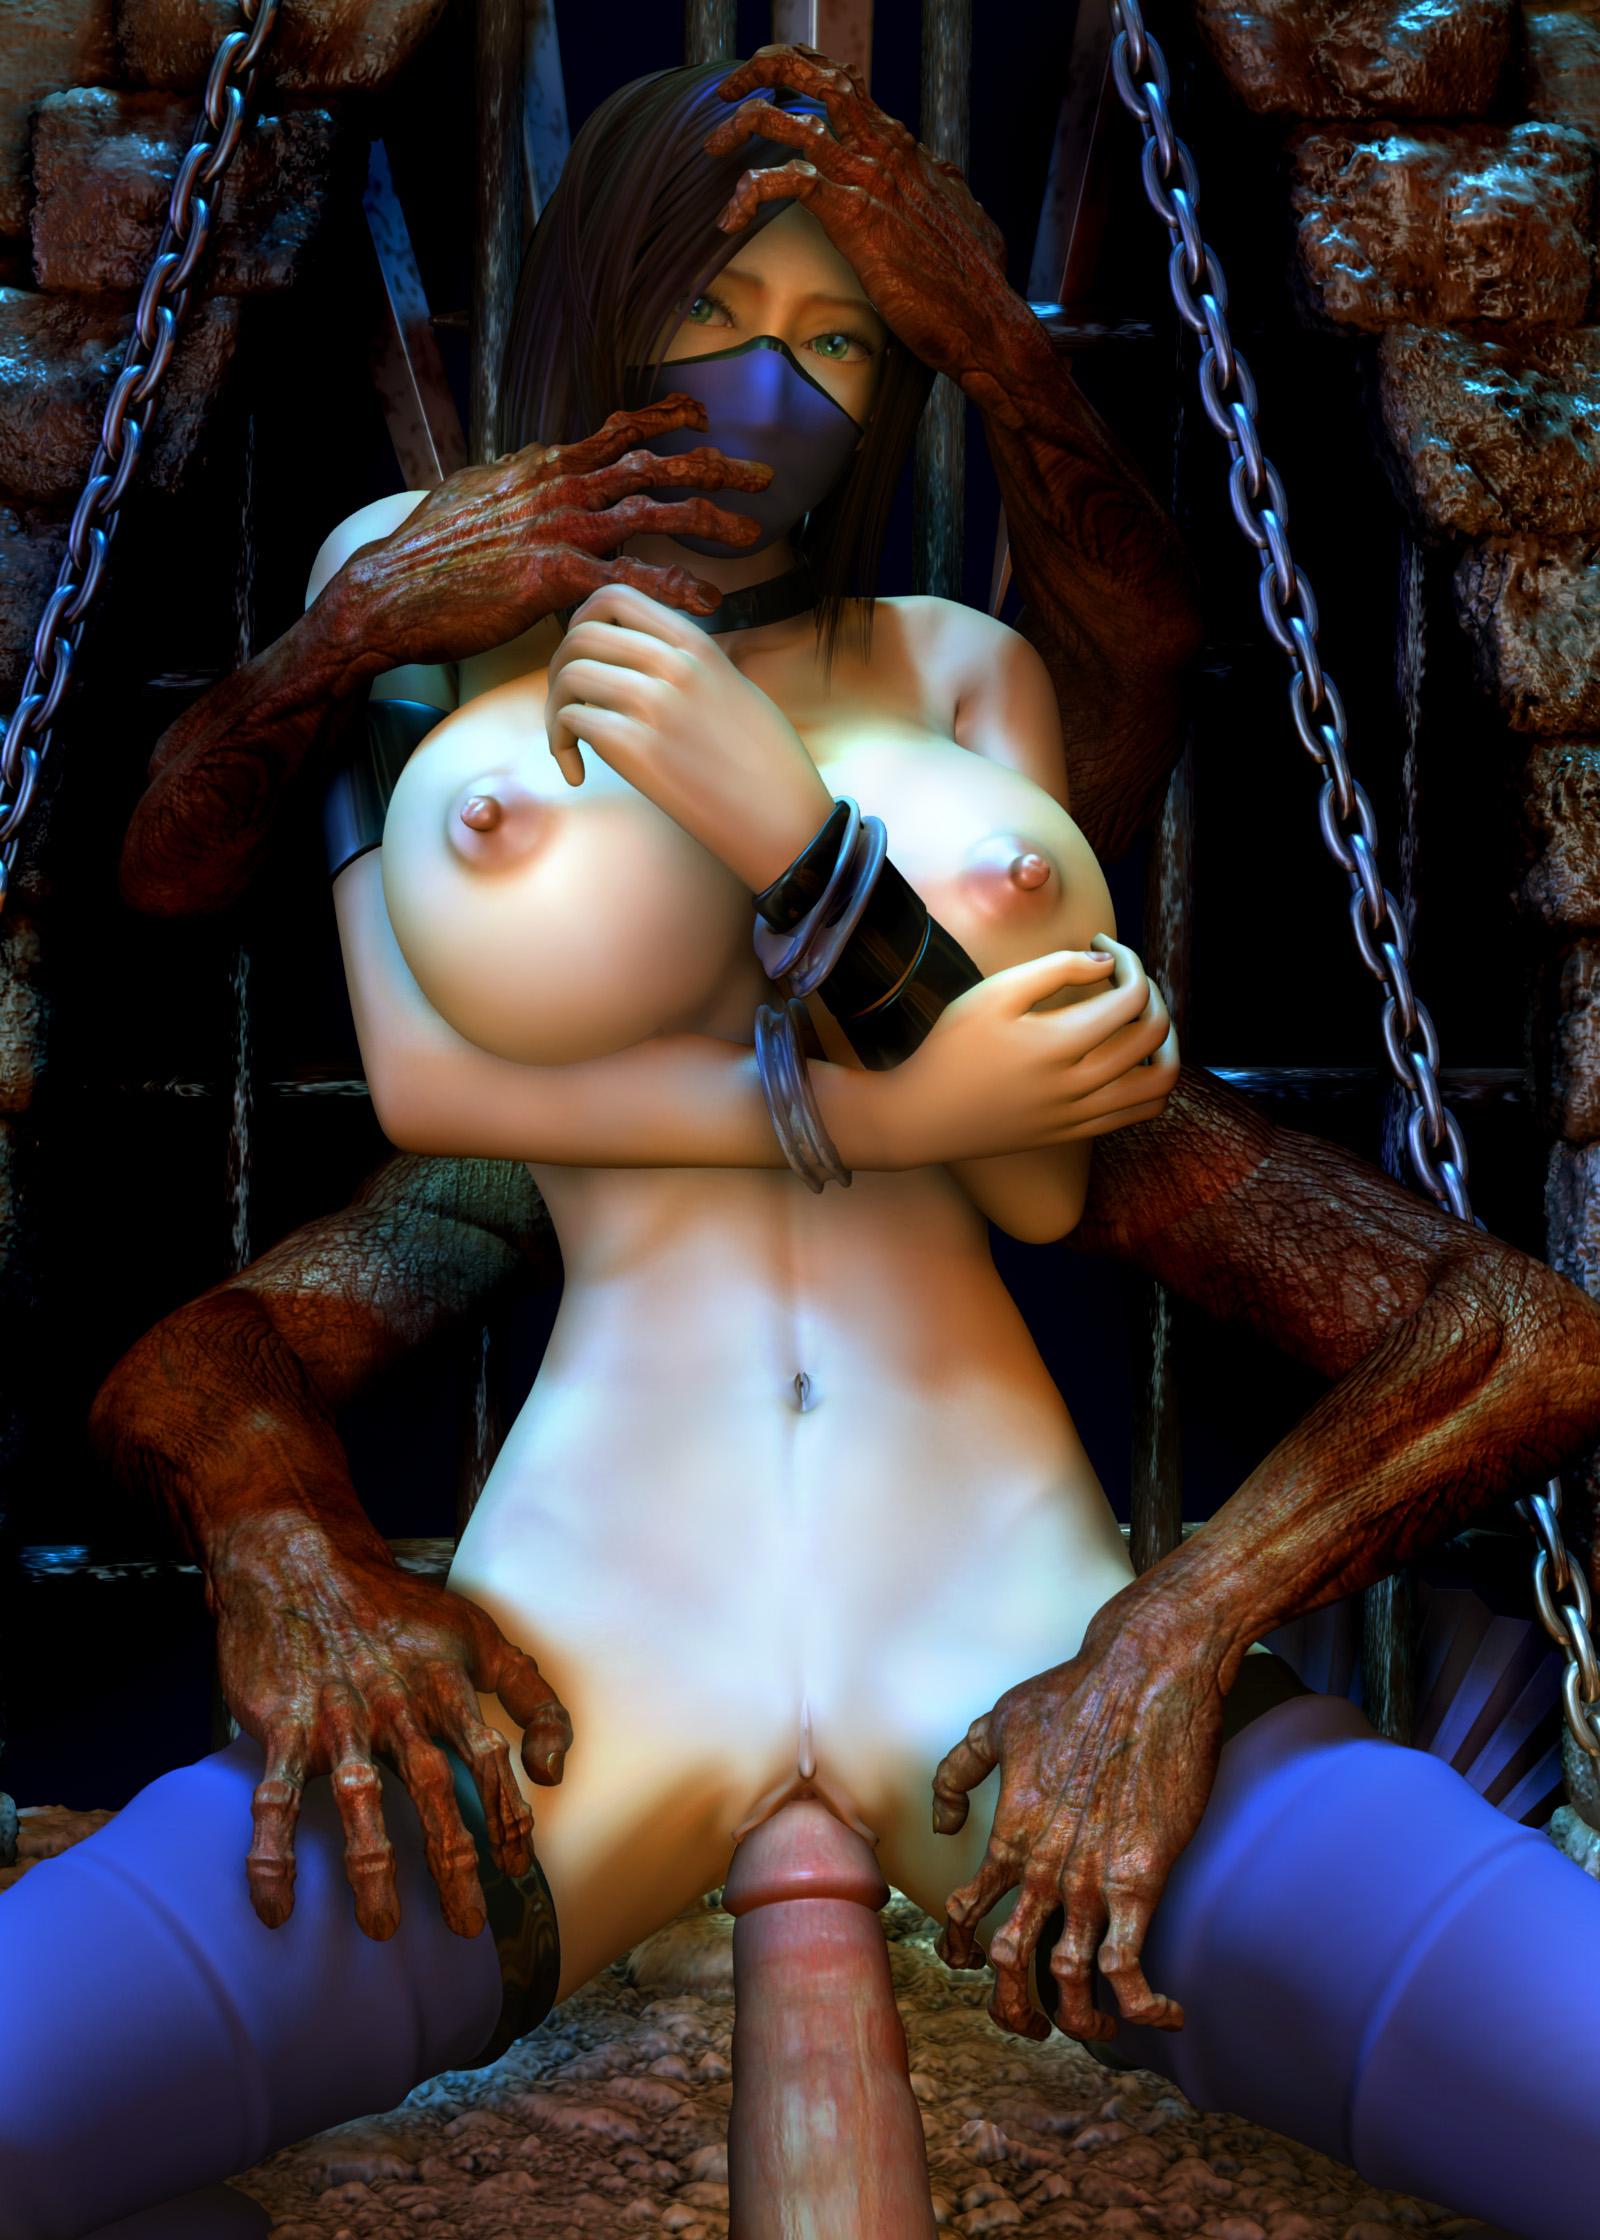 sexy naked mortal kombat girls